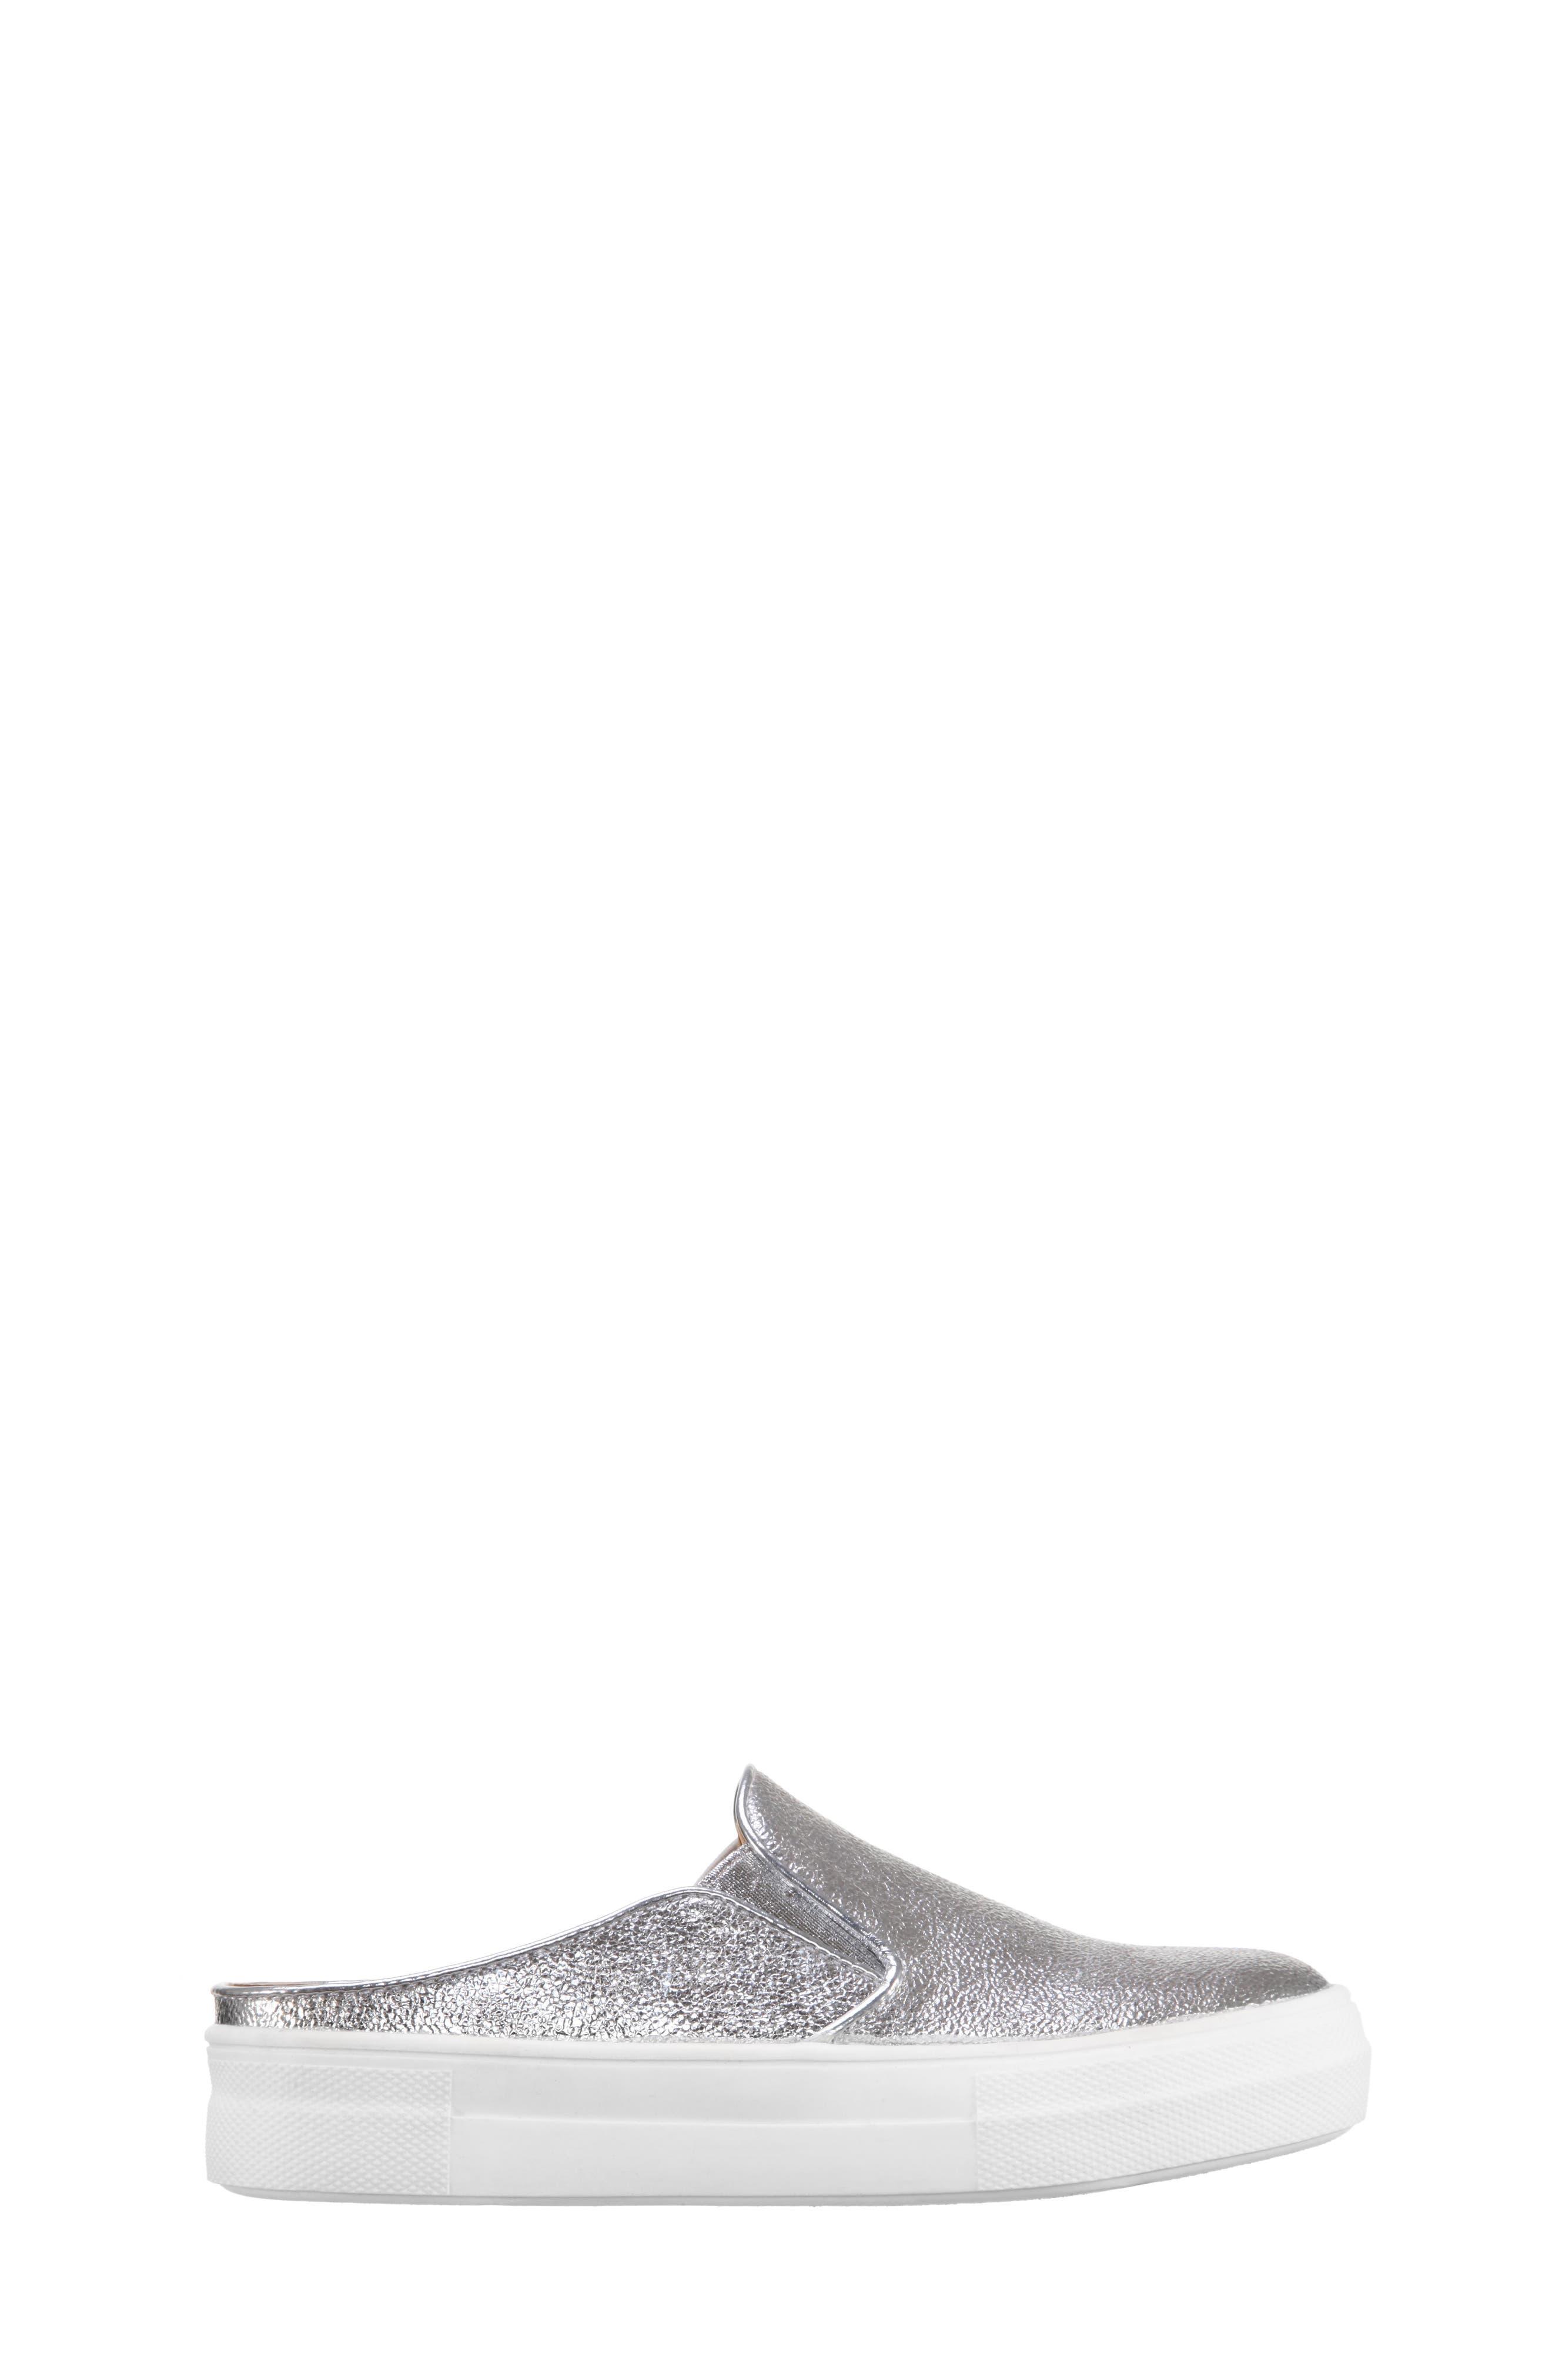 Gail Metallic Slip-On Sneaker Mule,                             Alternate thumbnail 3, color,                             044